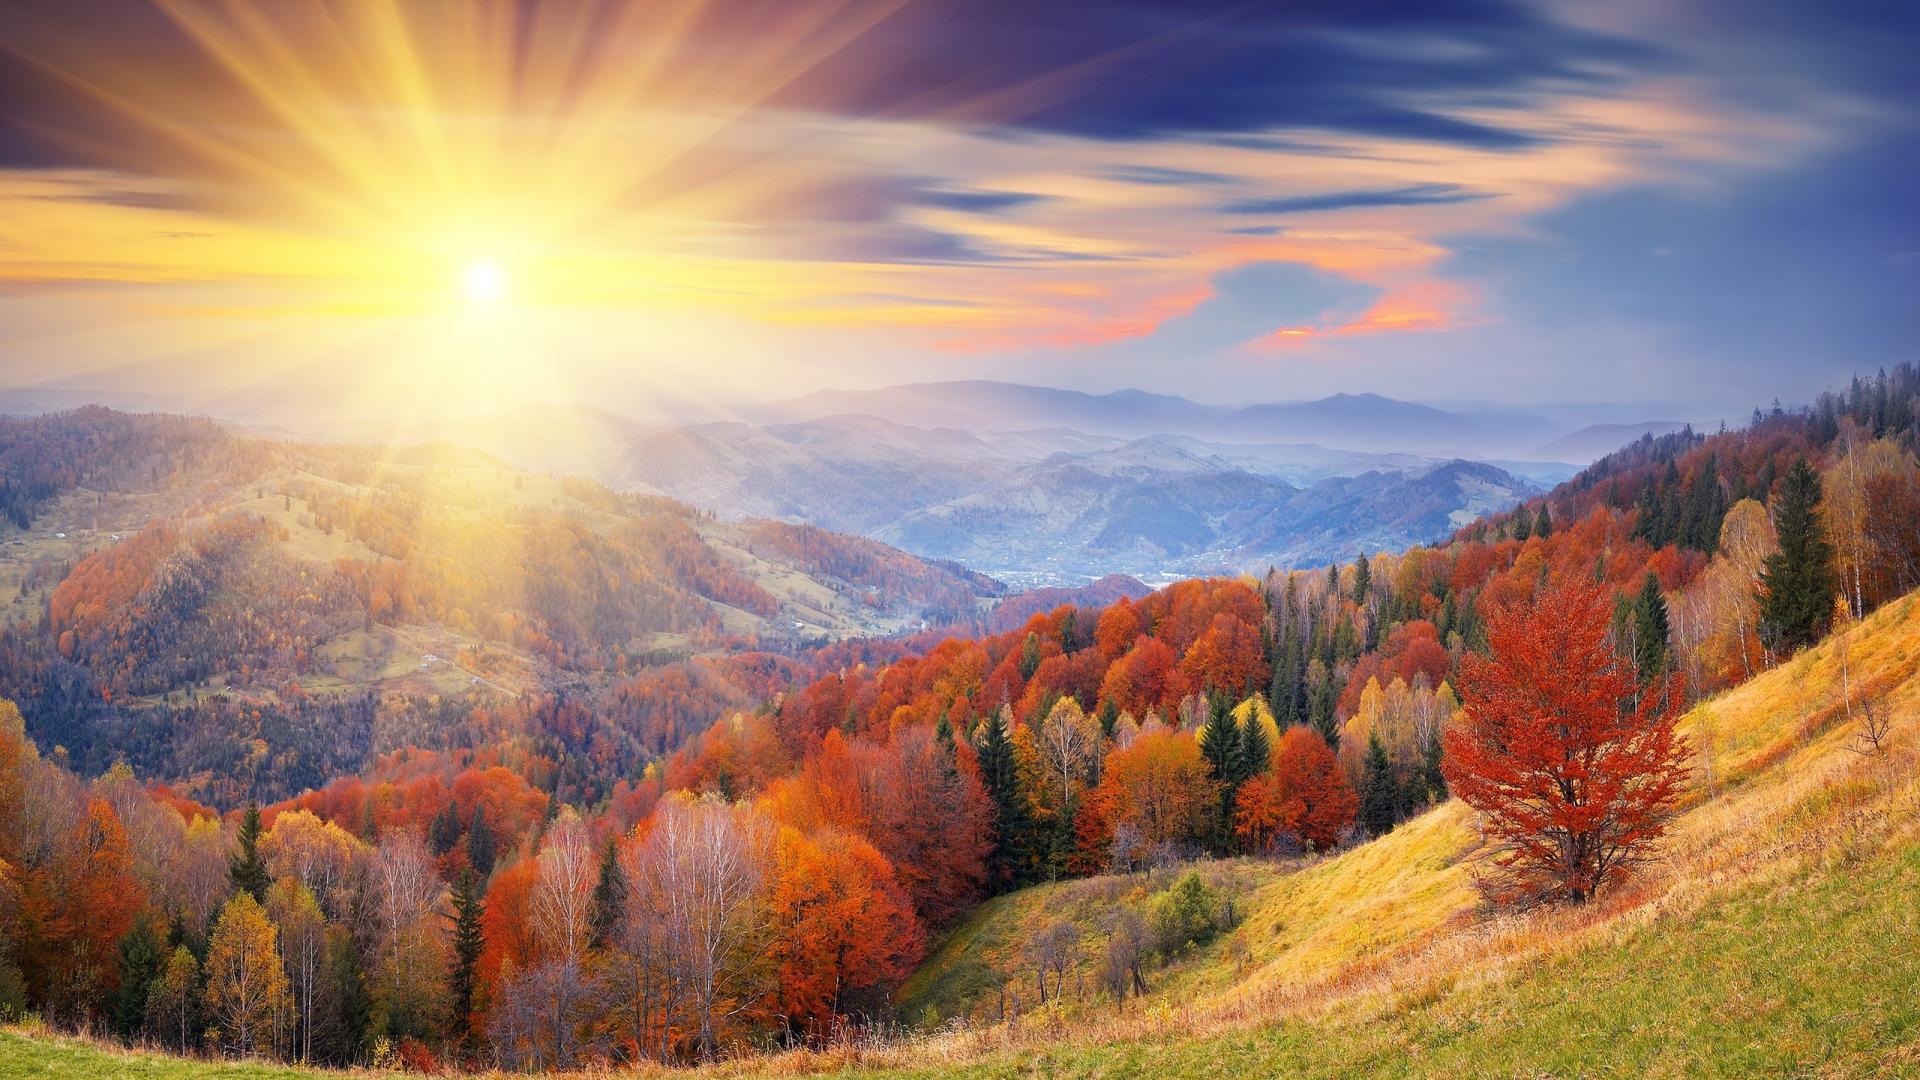 Hd Beautiful Nature Wallpapers Desktop backgrounds Download 1920x1080